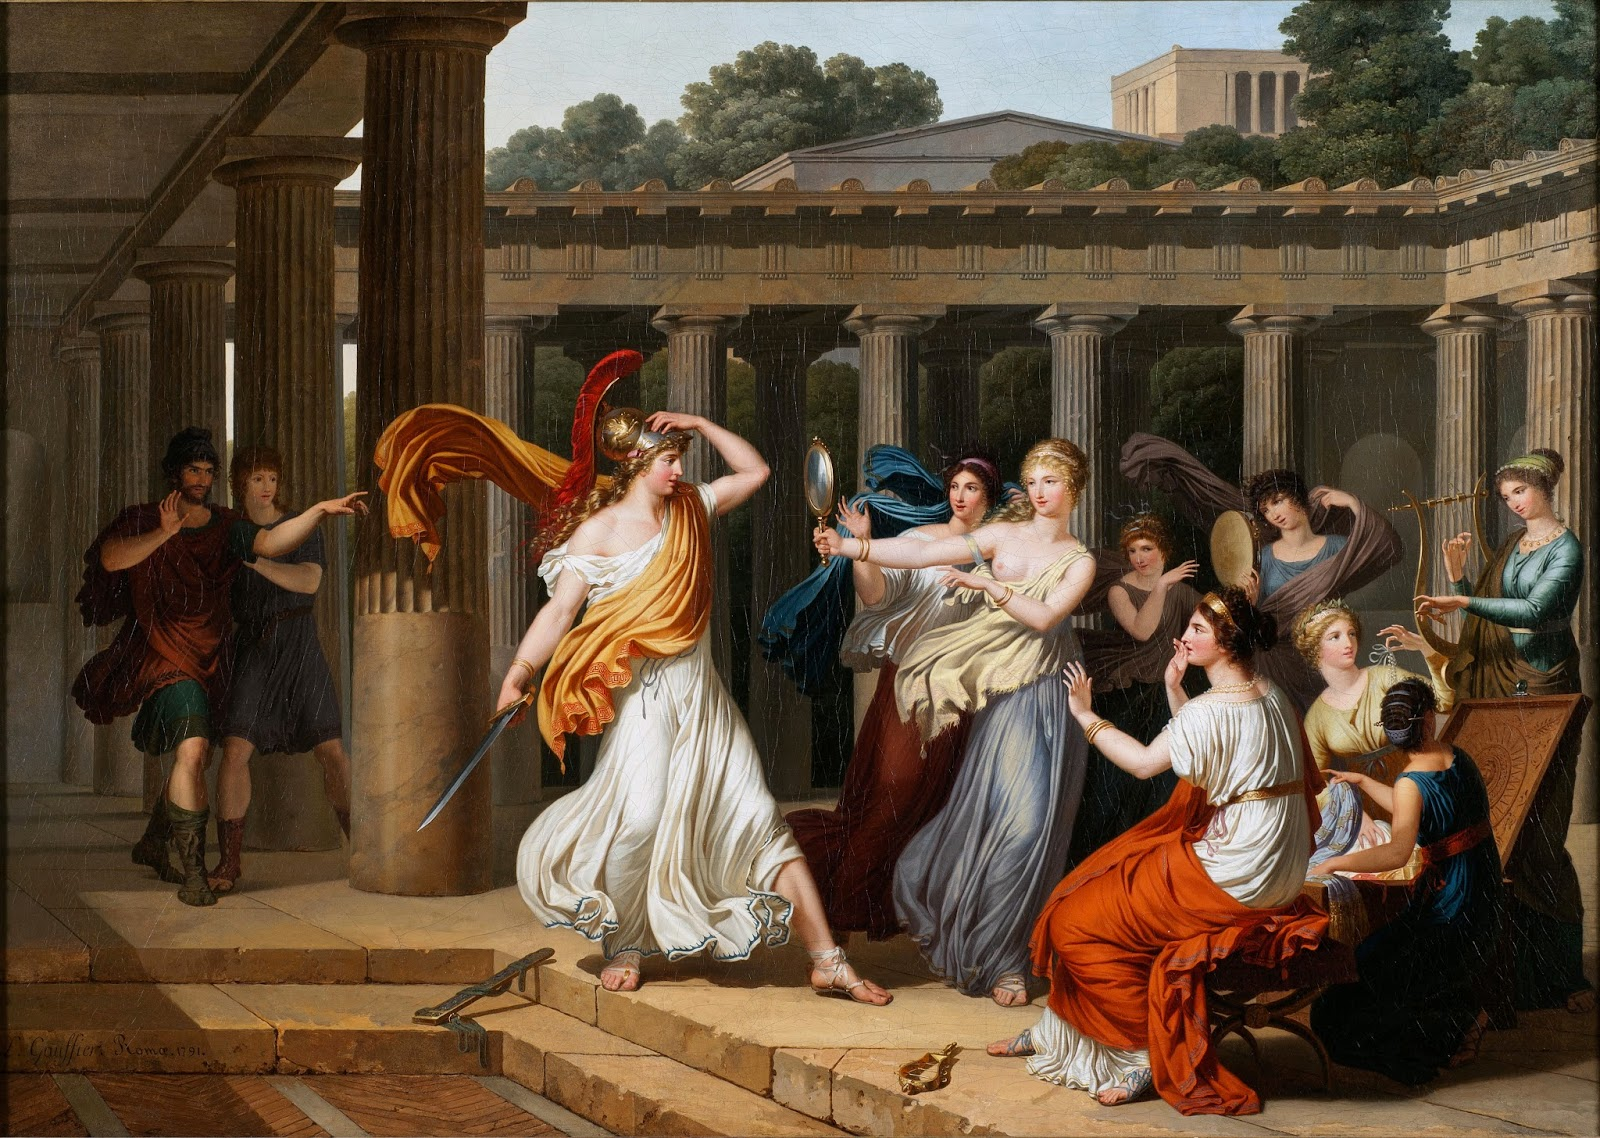 similarities between odysseus and telemachus